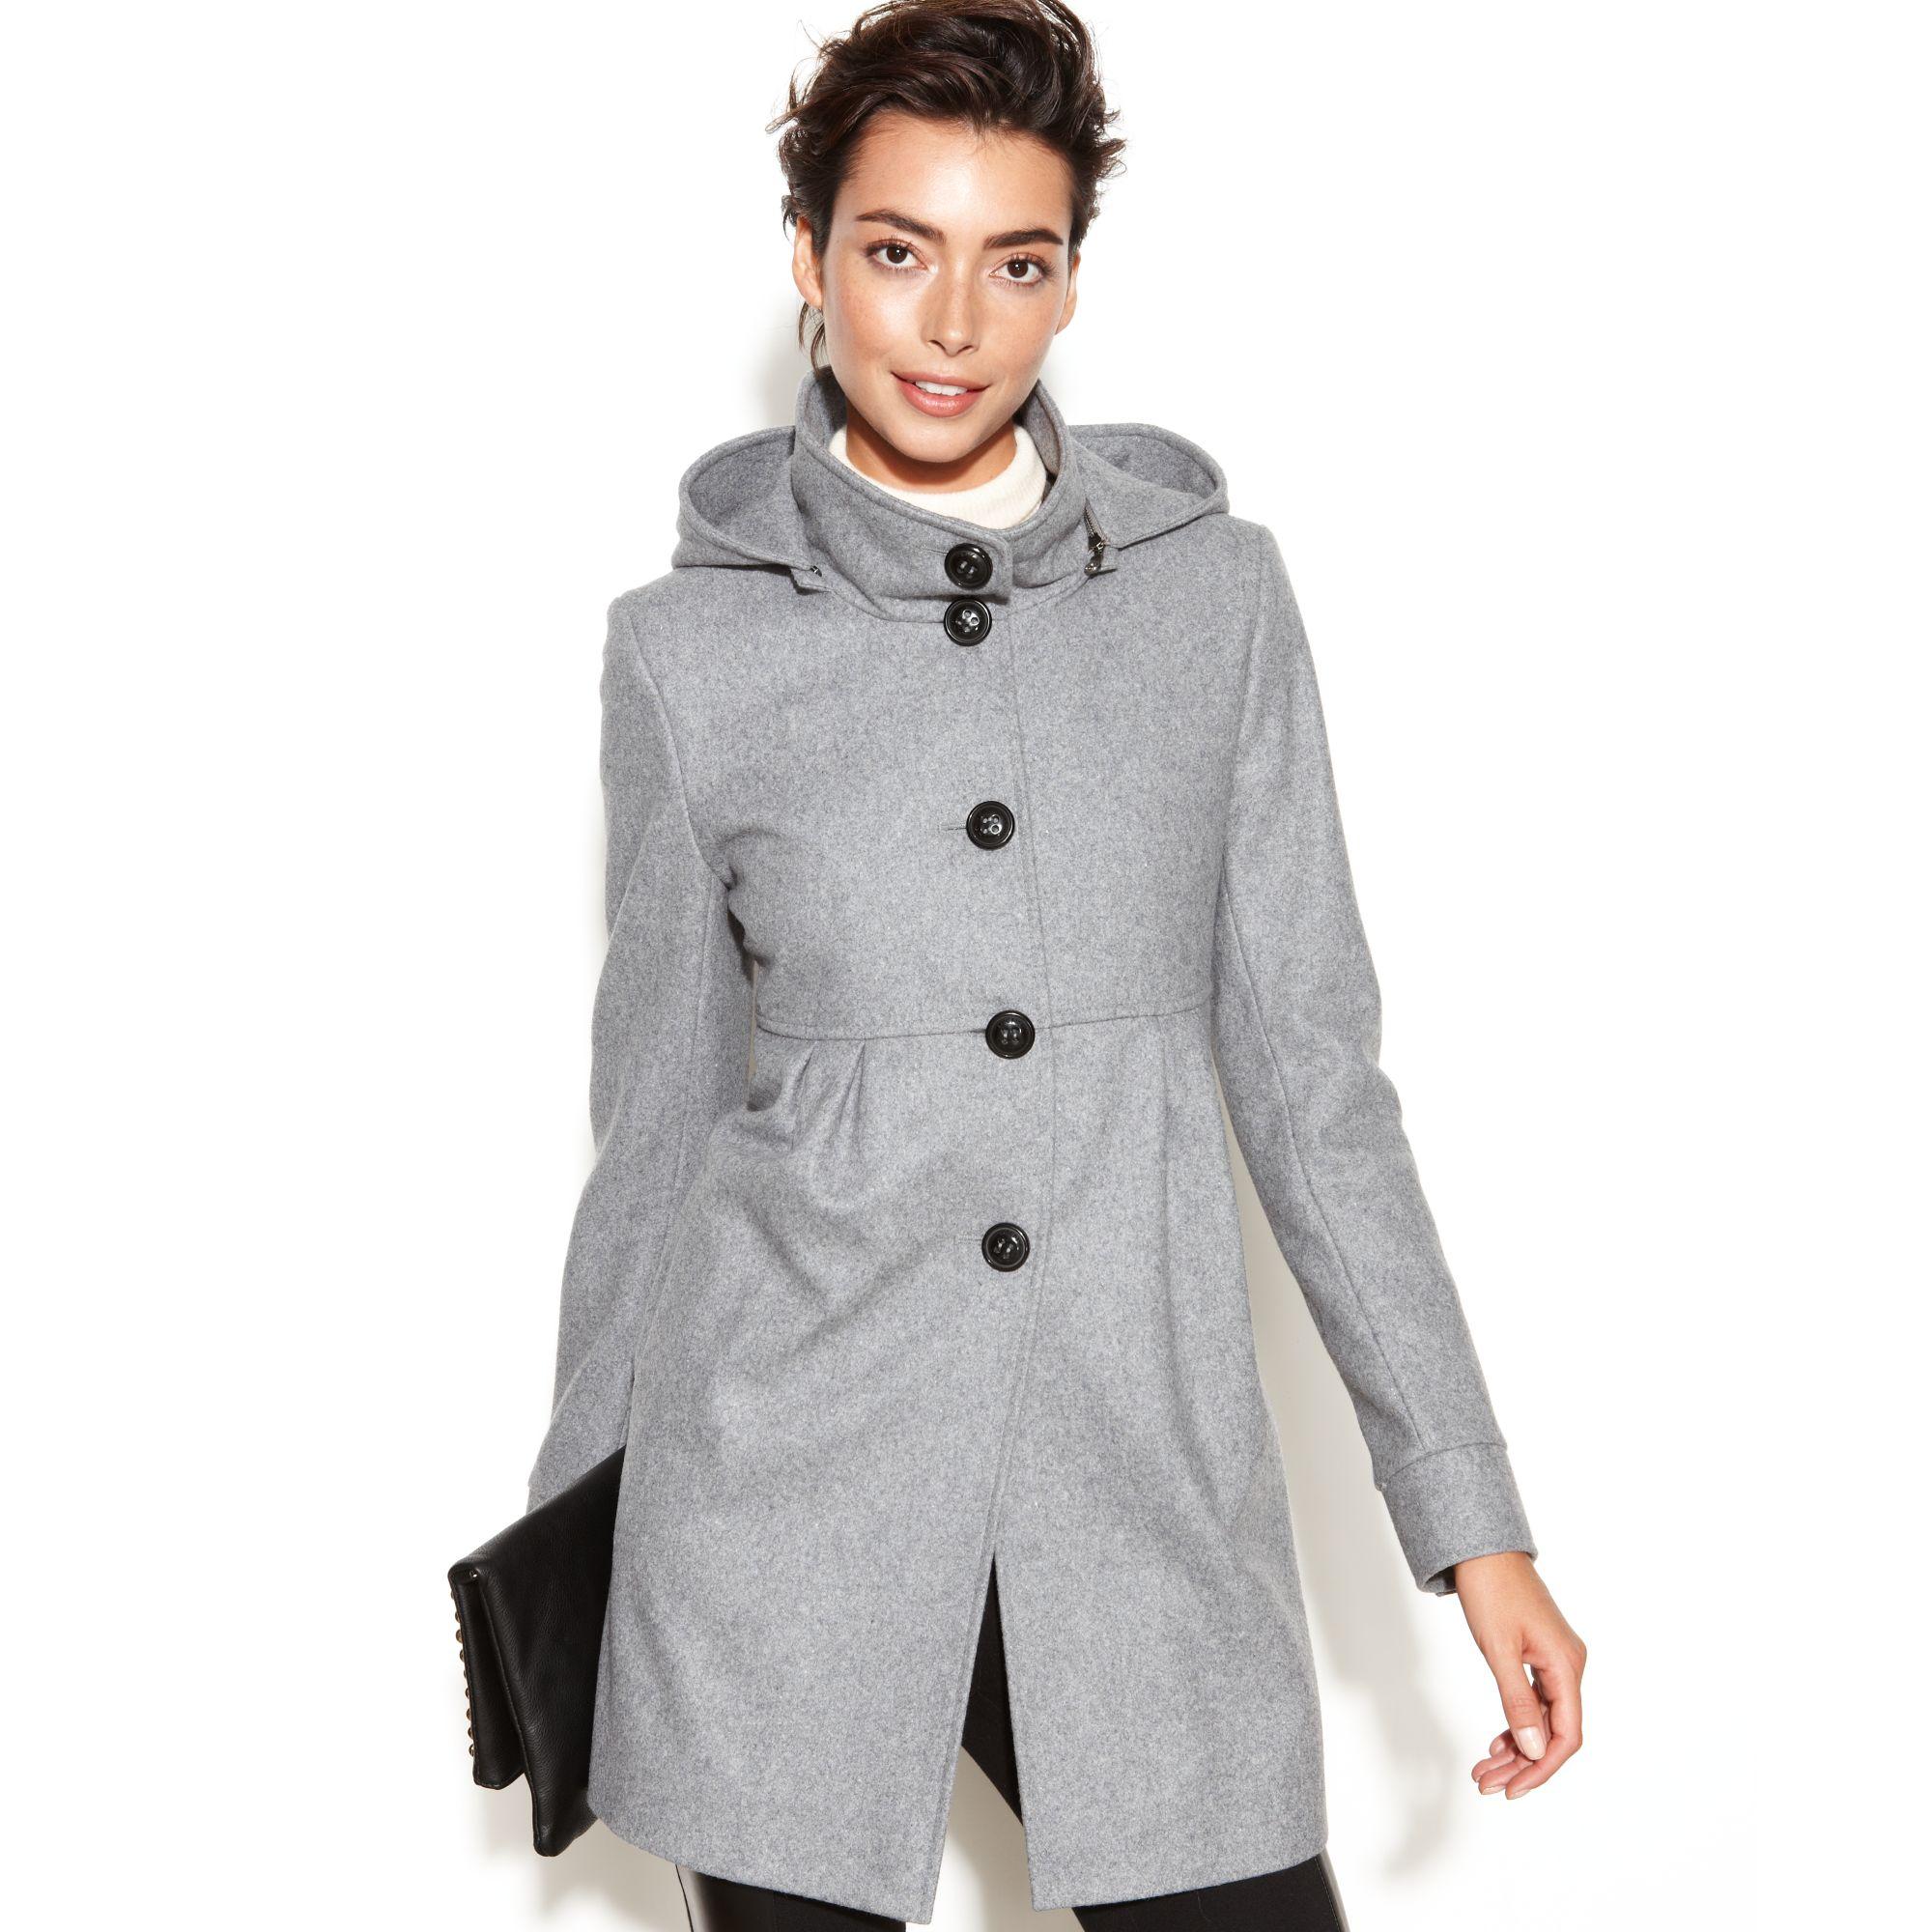 Dkny Hooded Wool Blend Babydoll in Gray | Lyst